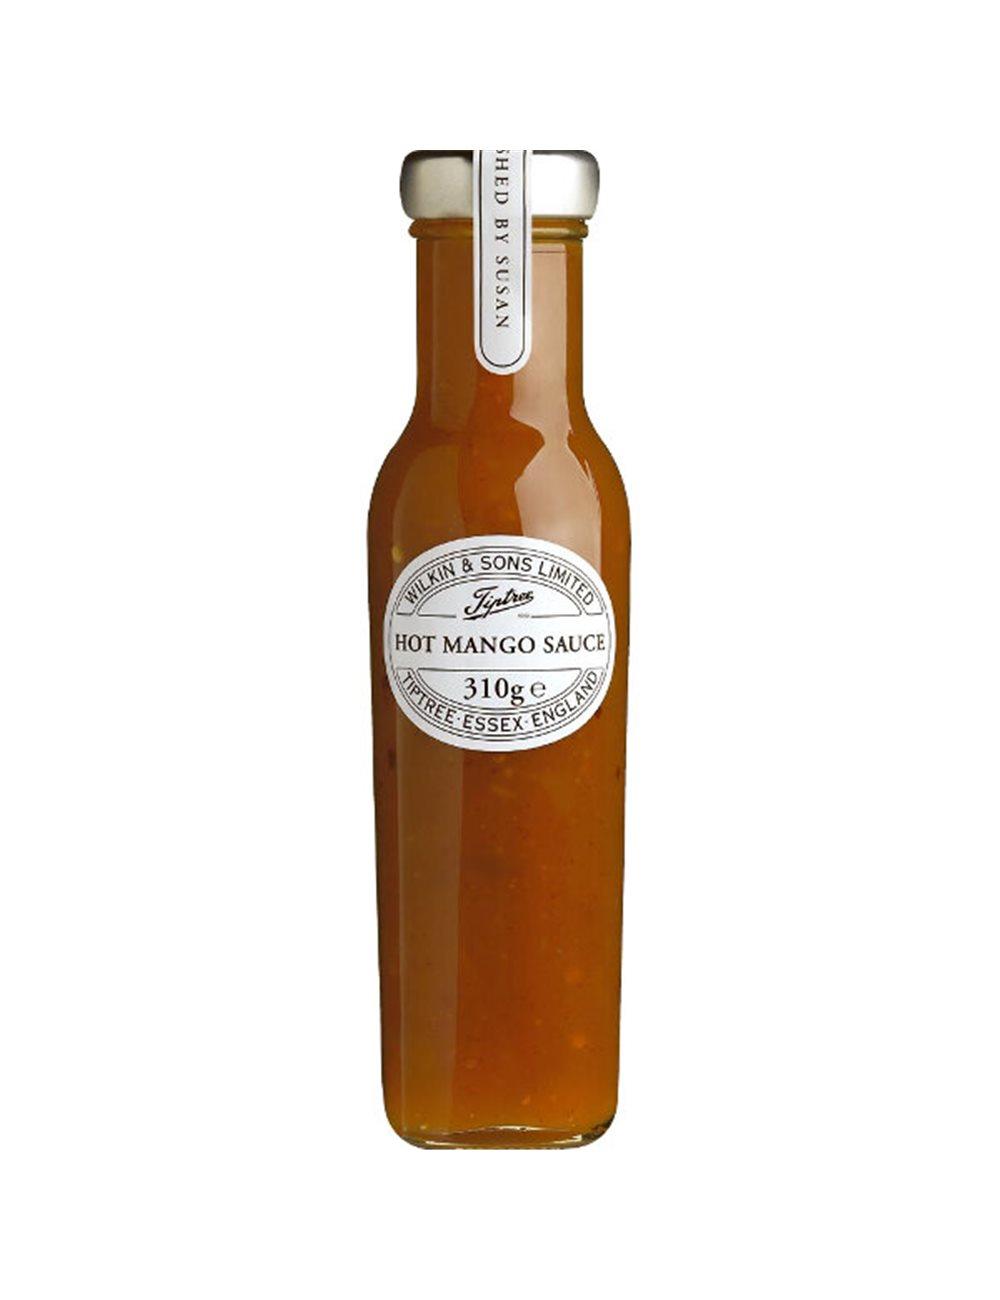 Hot Mango Sauce 310g